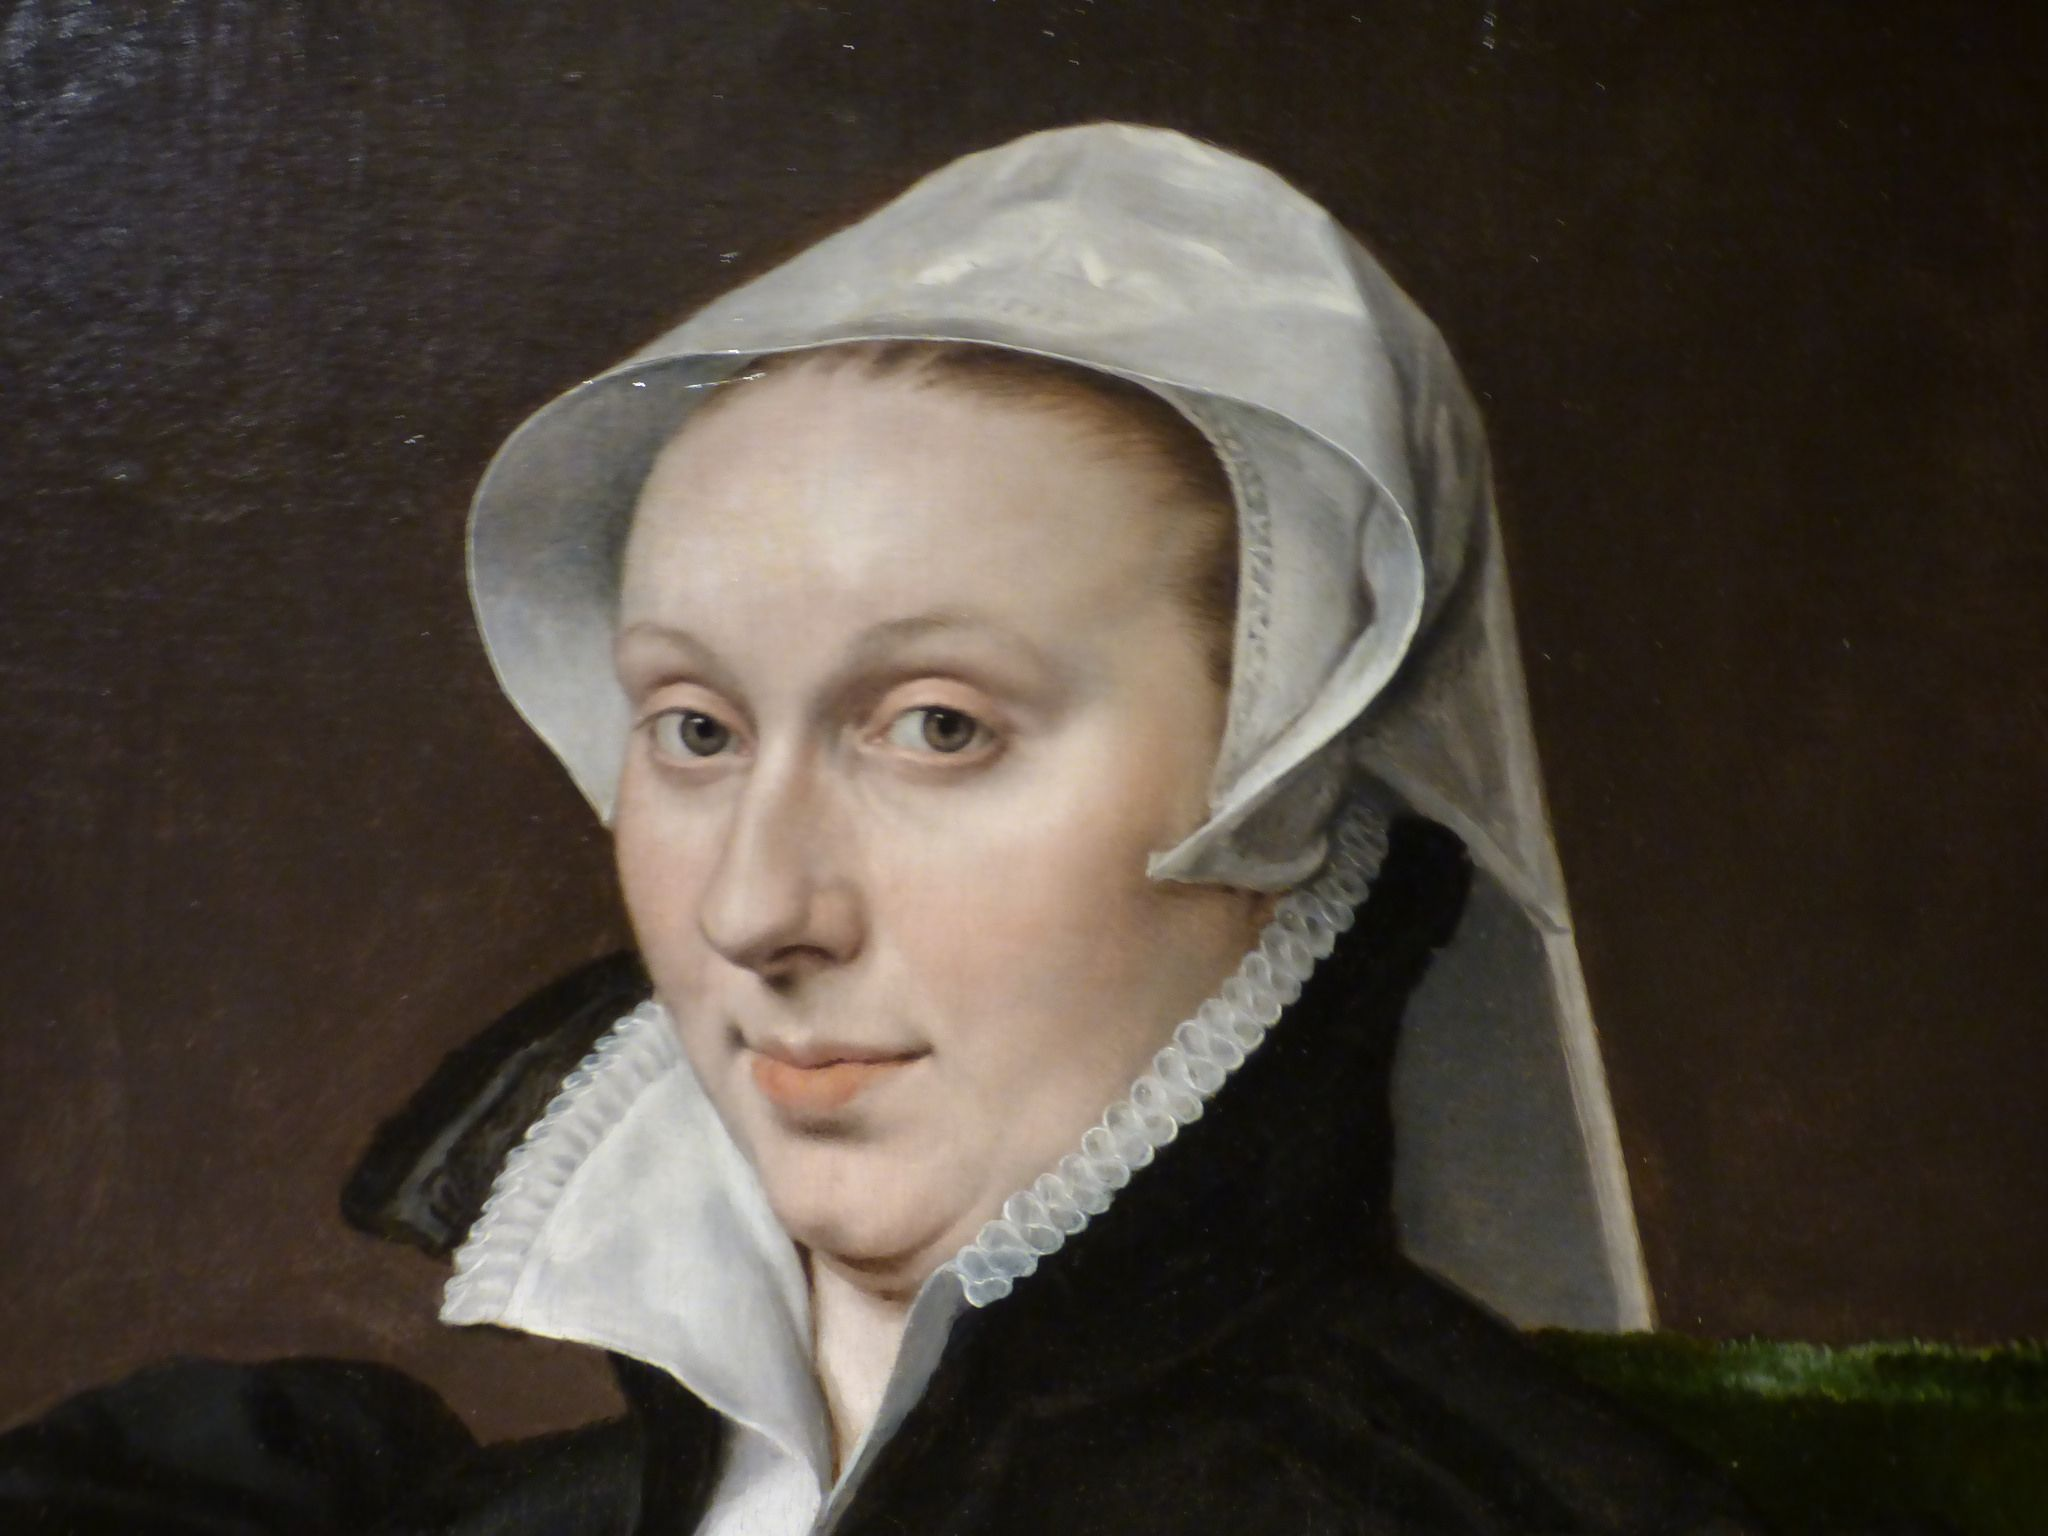 Portrait of Anne Fernely (detail), Anthonis Mor, c. 1560 - c. 1565